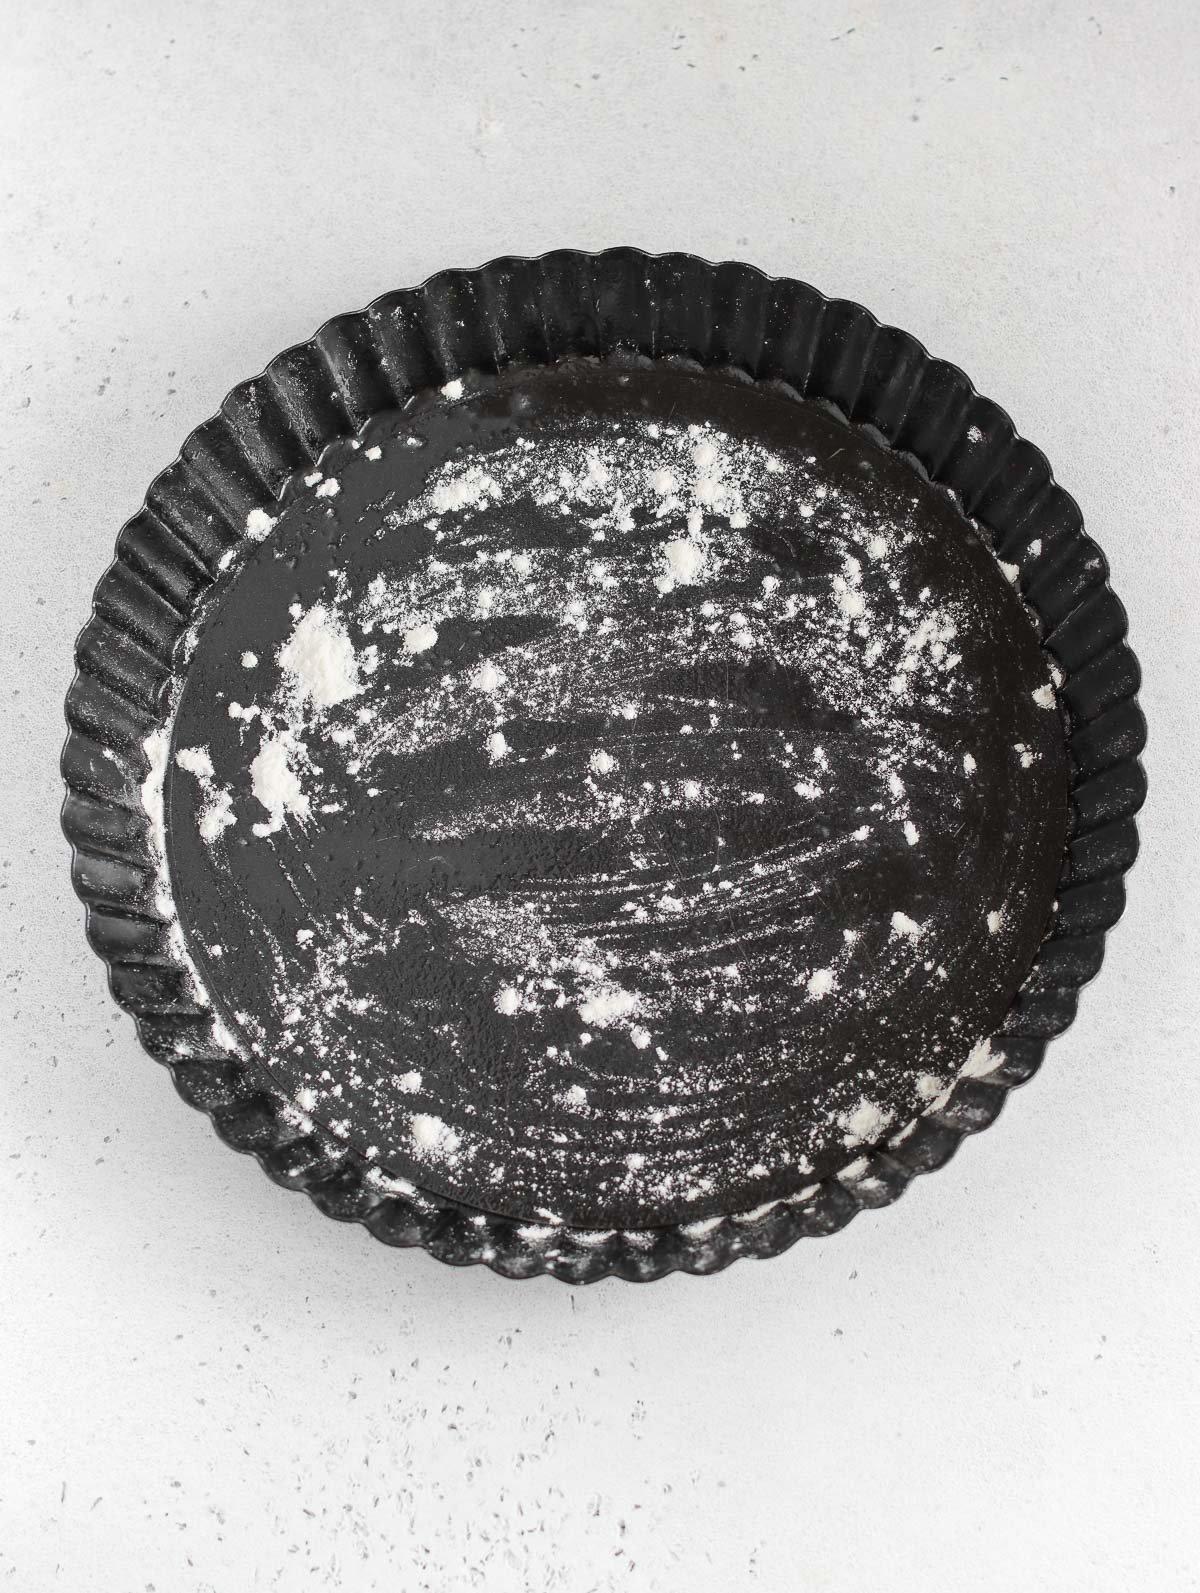 oiled pie dish